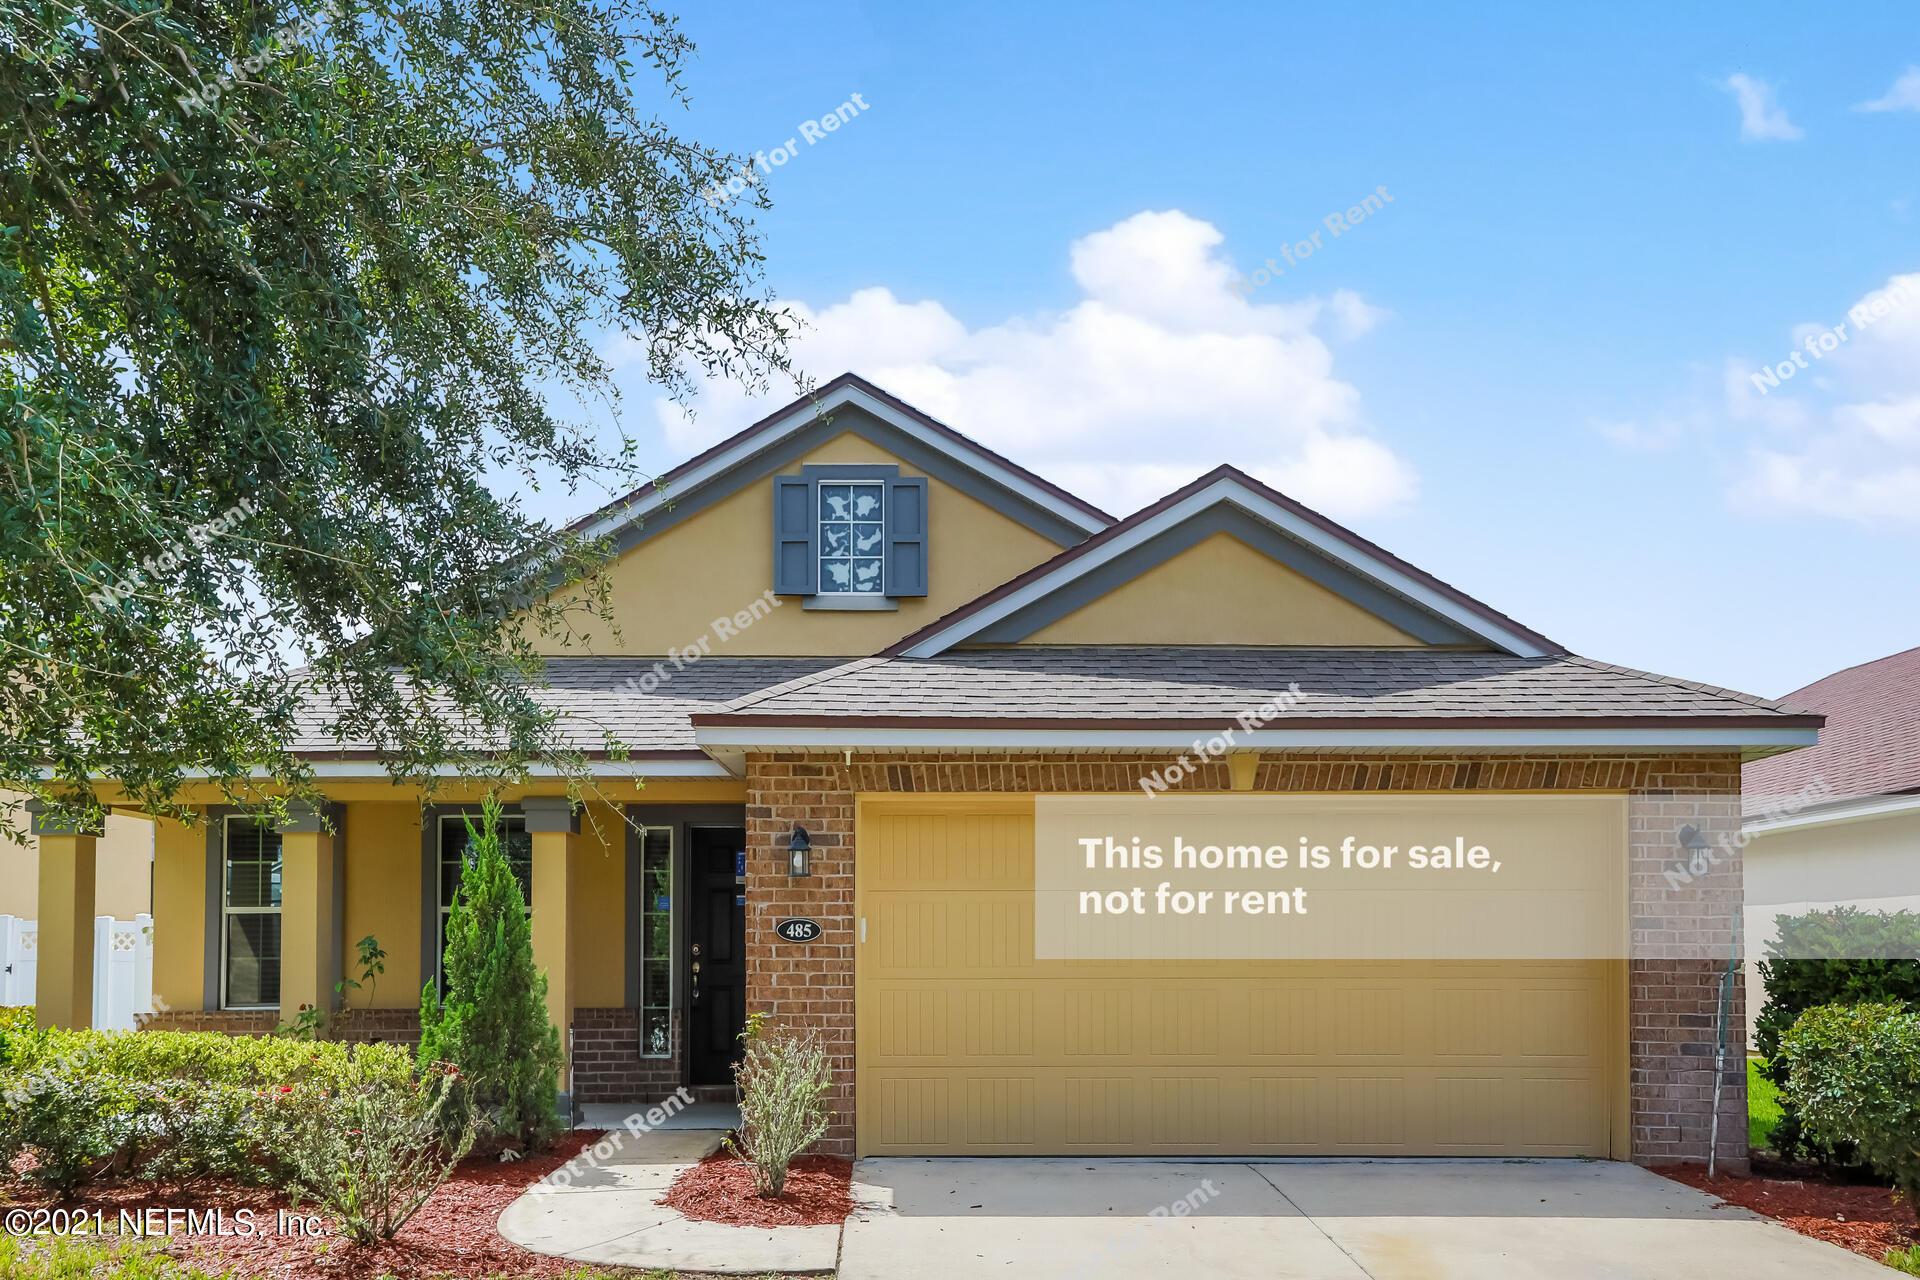 485 GLENDALE, ORANGE PARK, FLORIDA 32065, 3 Bedrooms Bedrooms, ,2 BathroomsBathrooms,Residential,For sale,GLENDALE,1131650